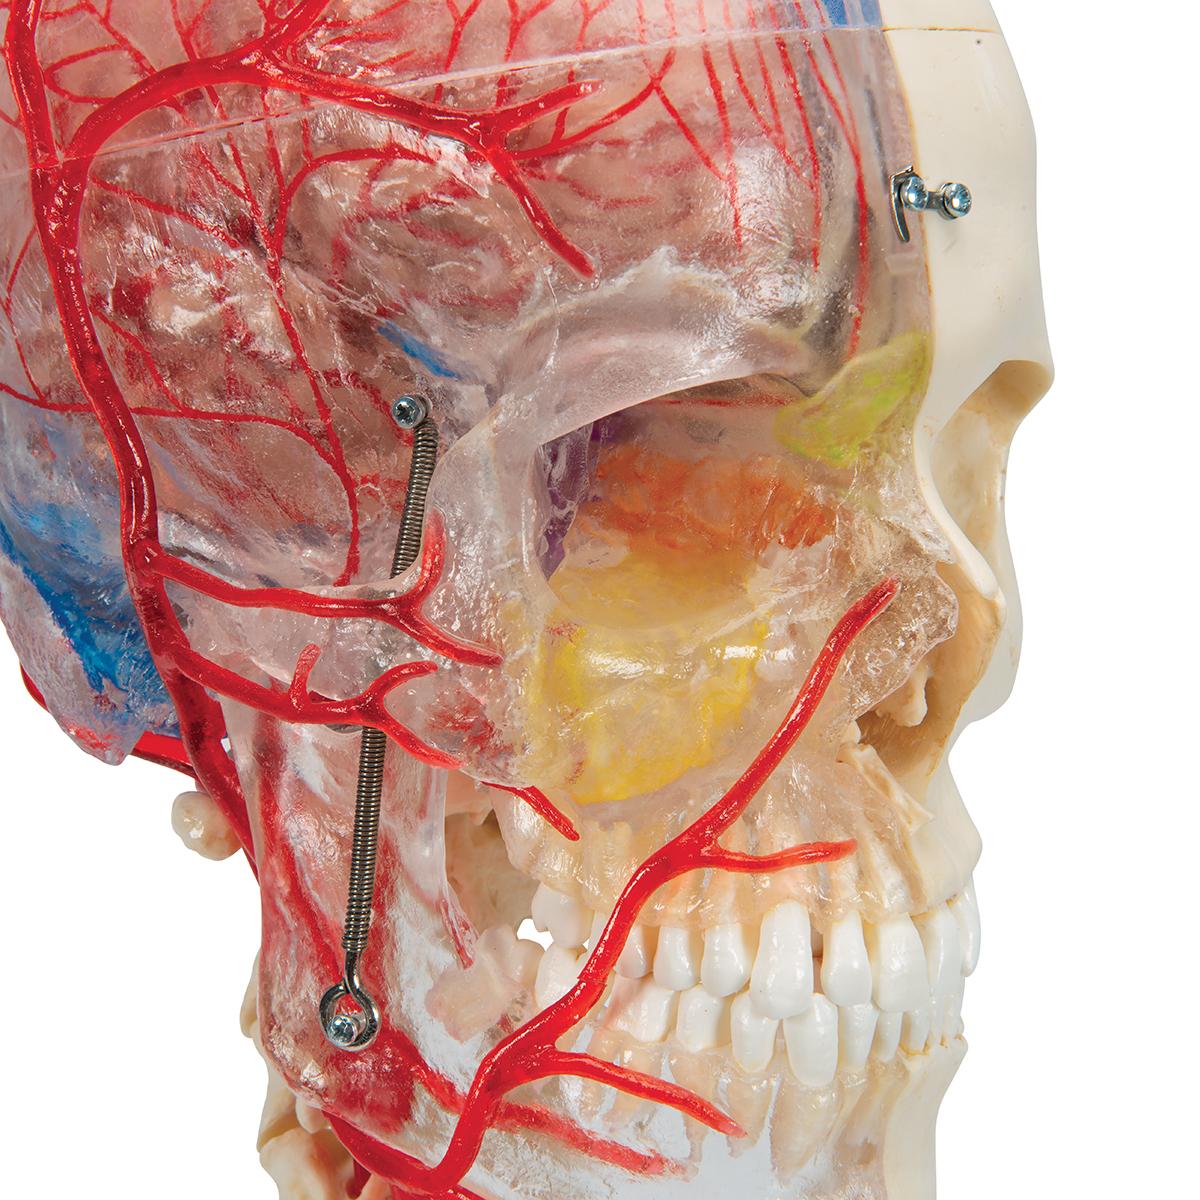 Human Skull Model - Plastic Skull Model - Realistic BONElike Human ...